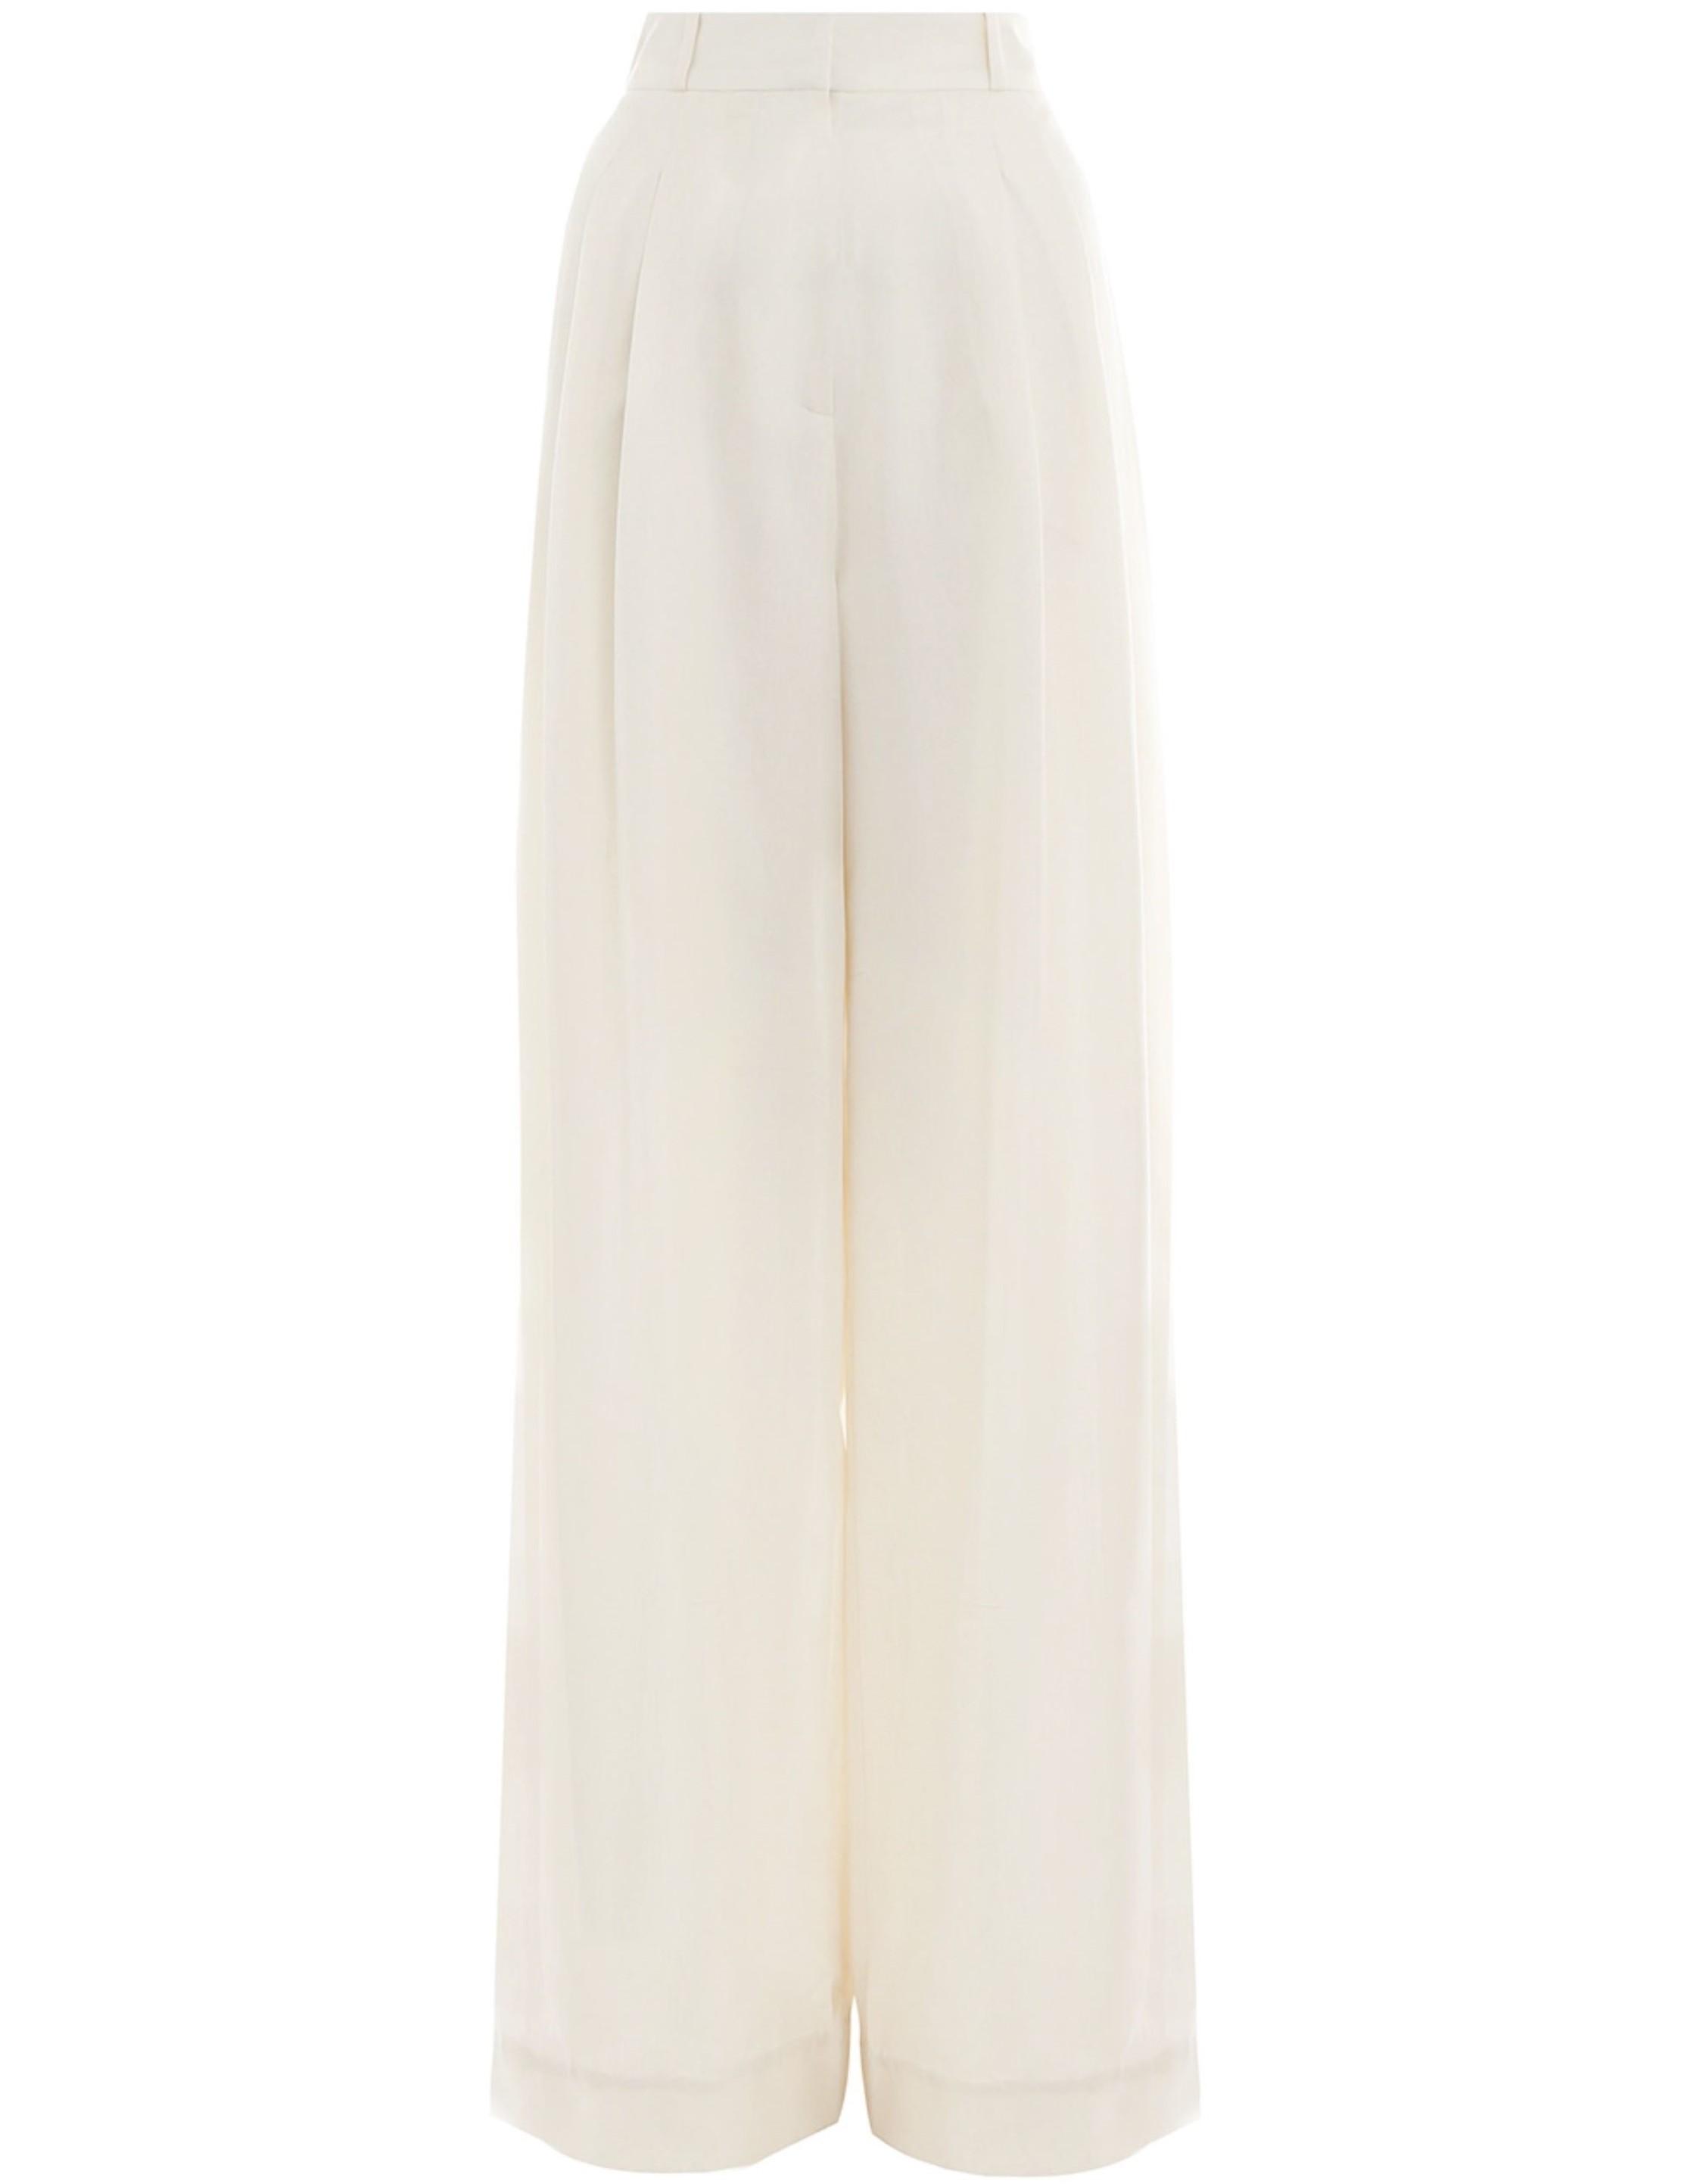 Moncur High Waist Wide Leg Pant